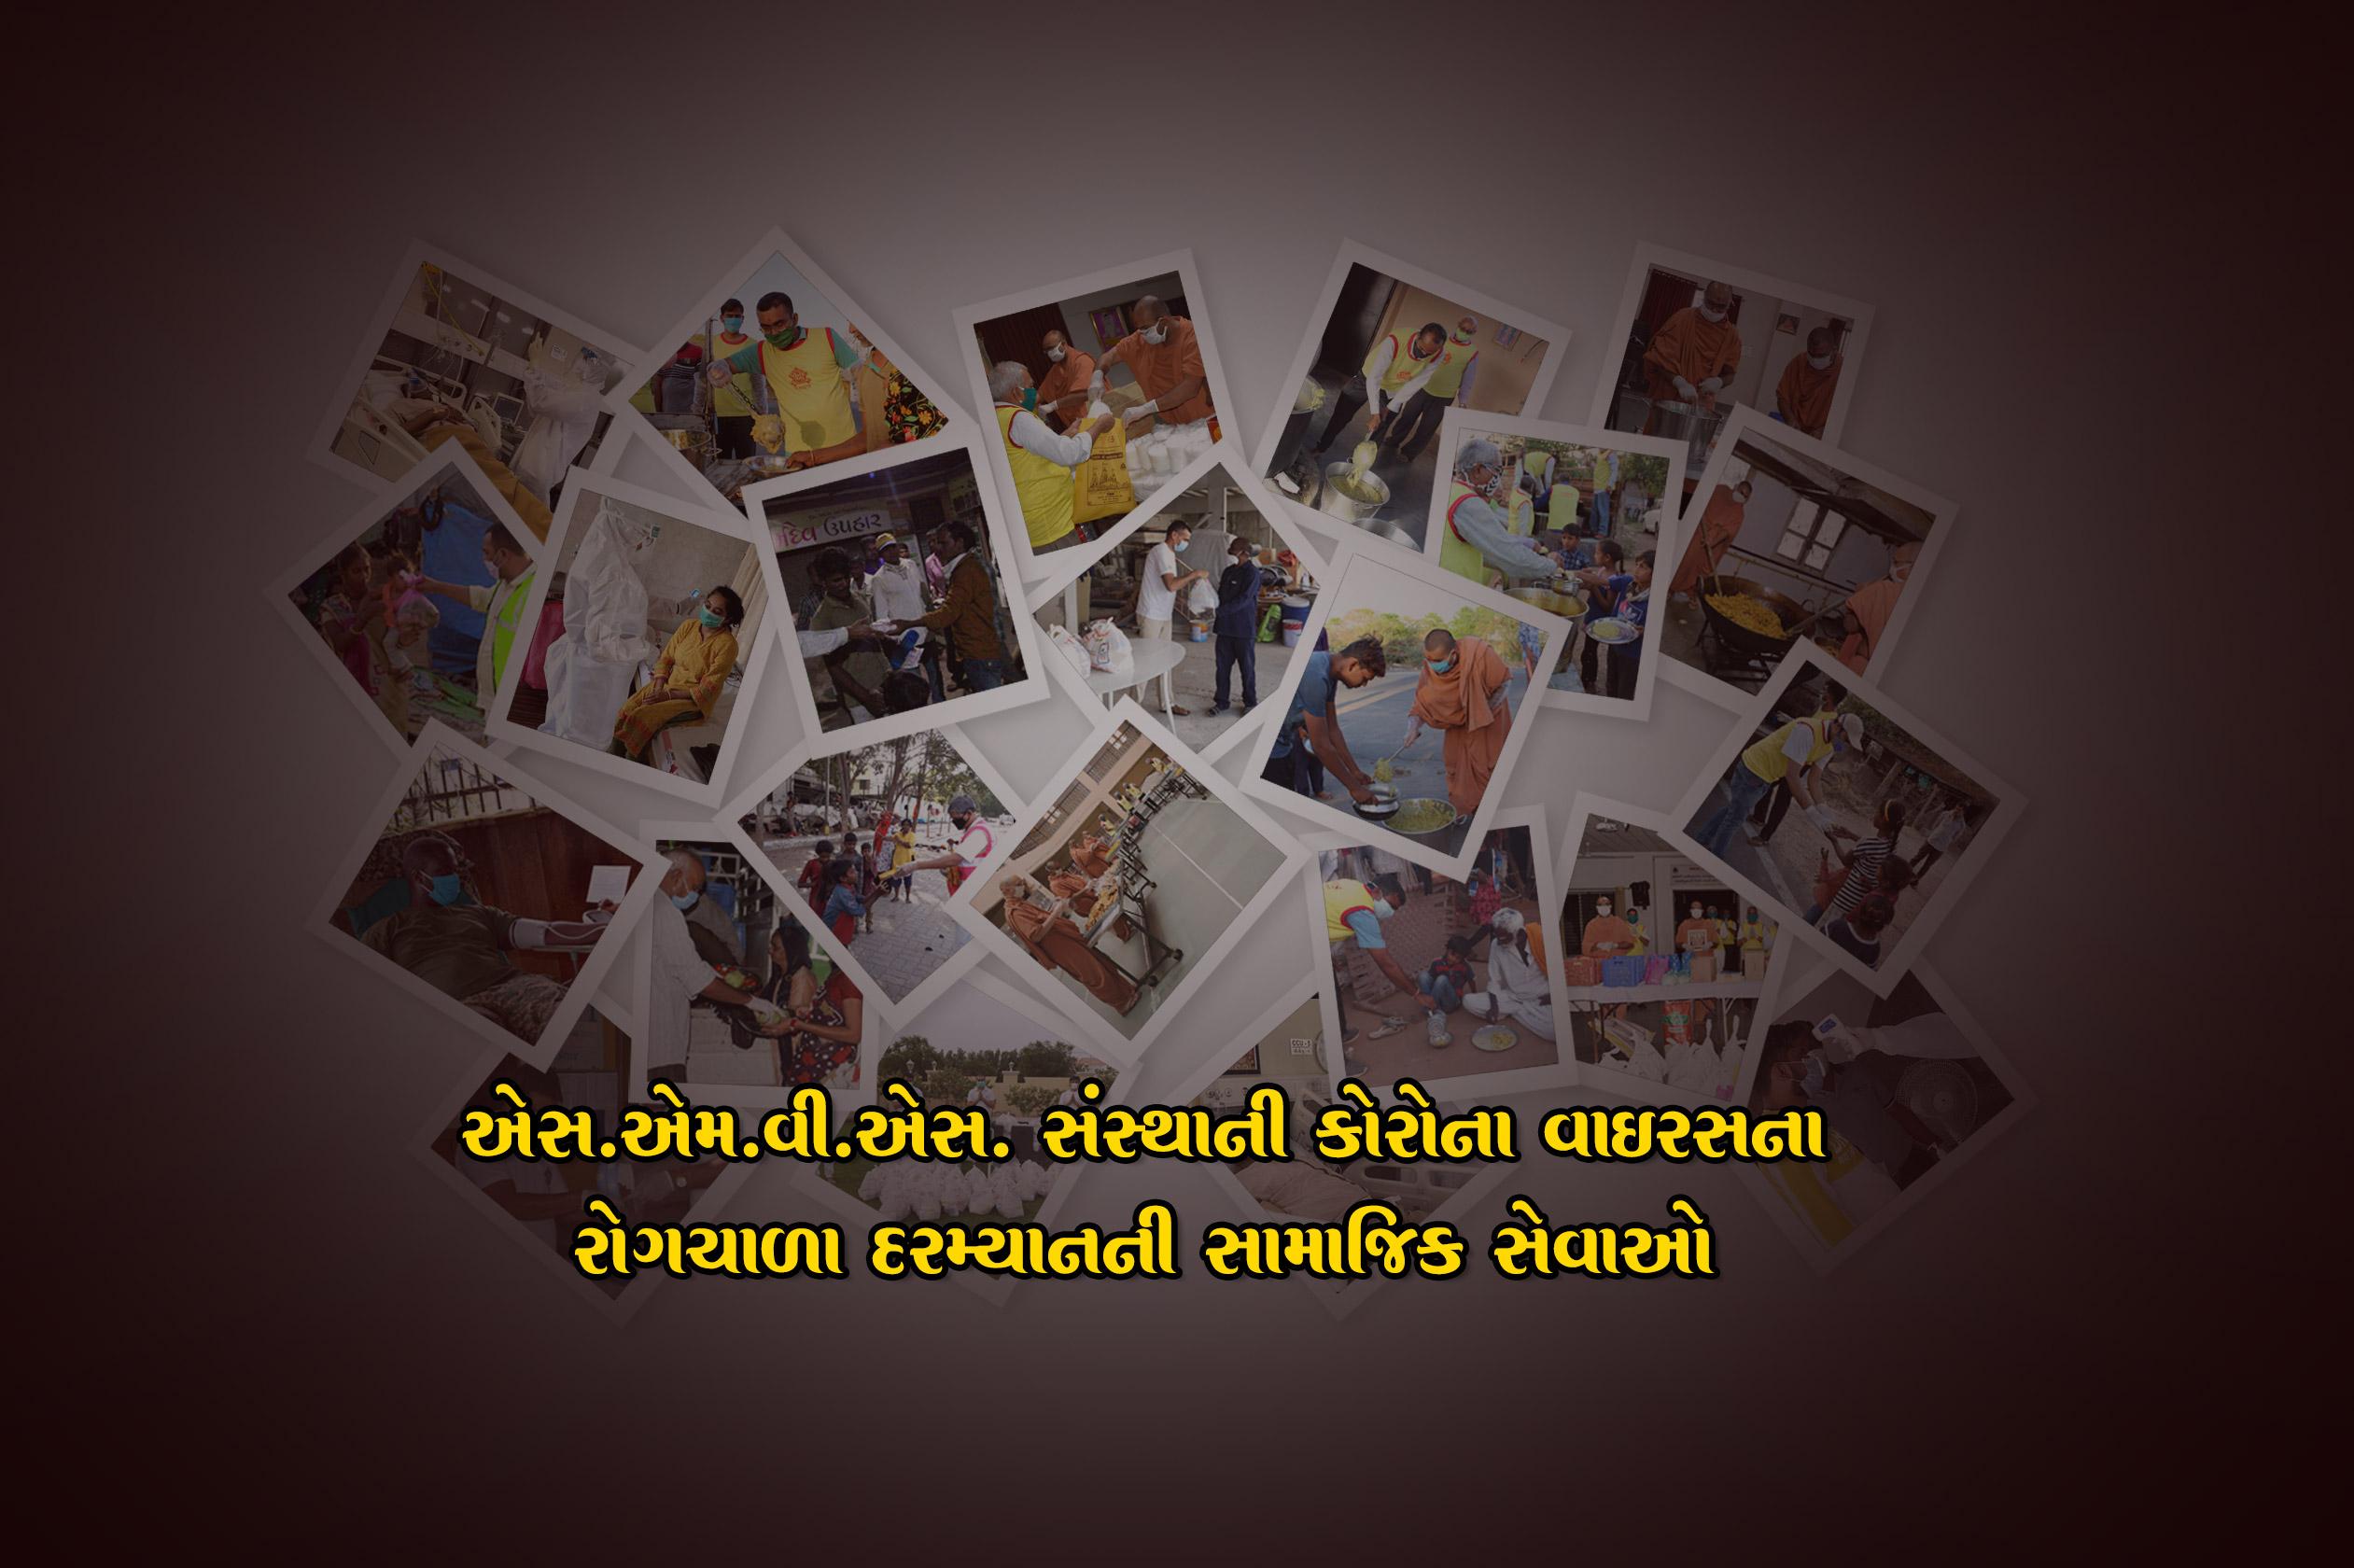 HDH Bapji Pratahm Smruti Utsav